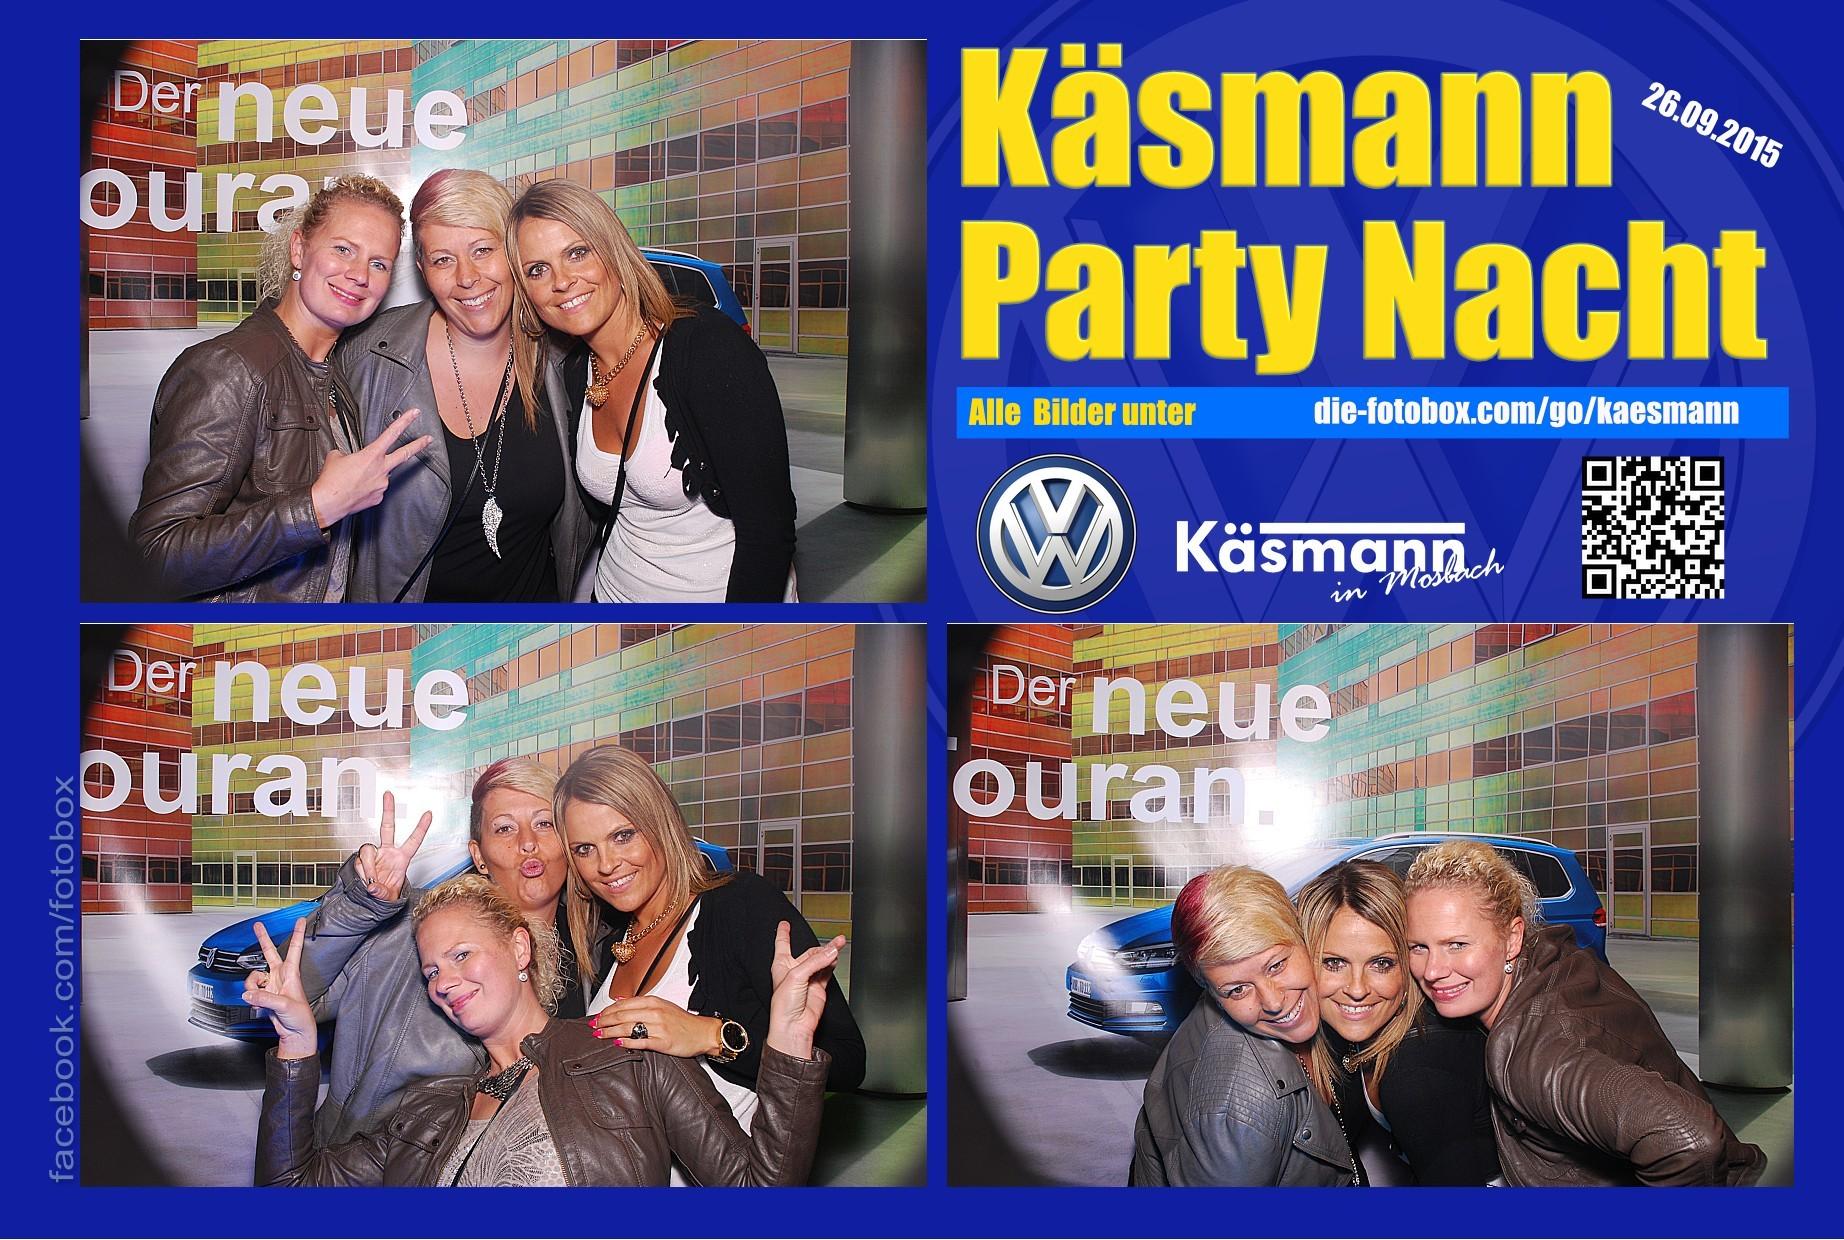 Käsmannparty 2015 - www.die-fotobox.com 01176